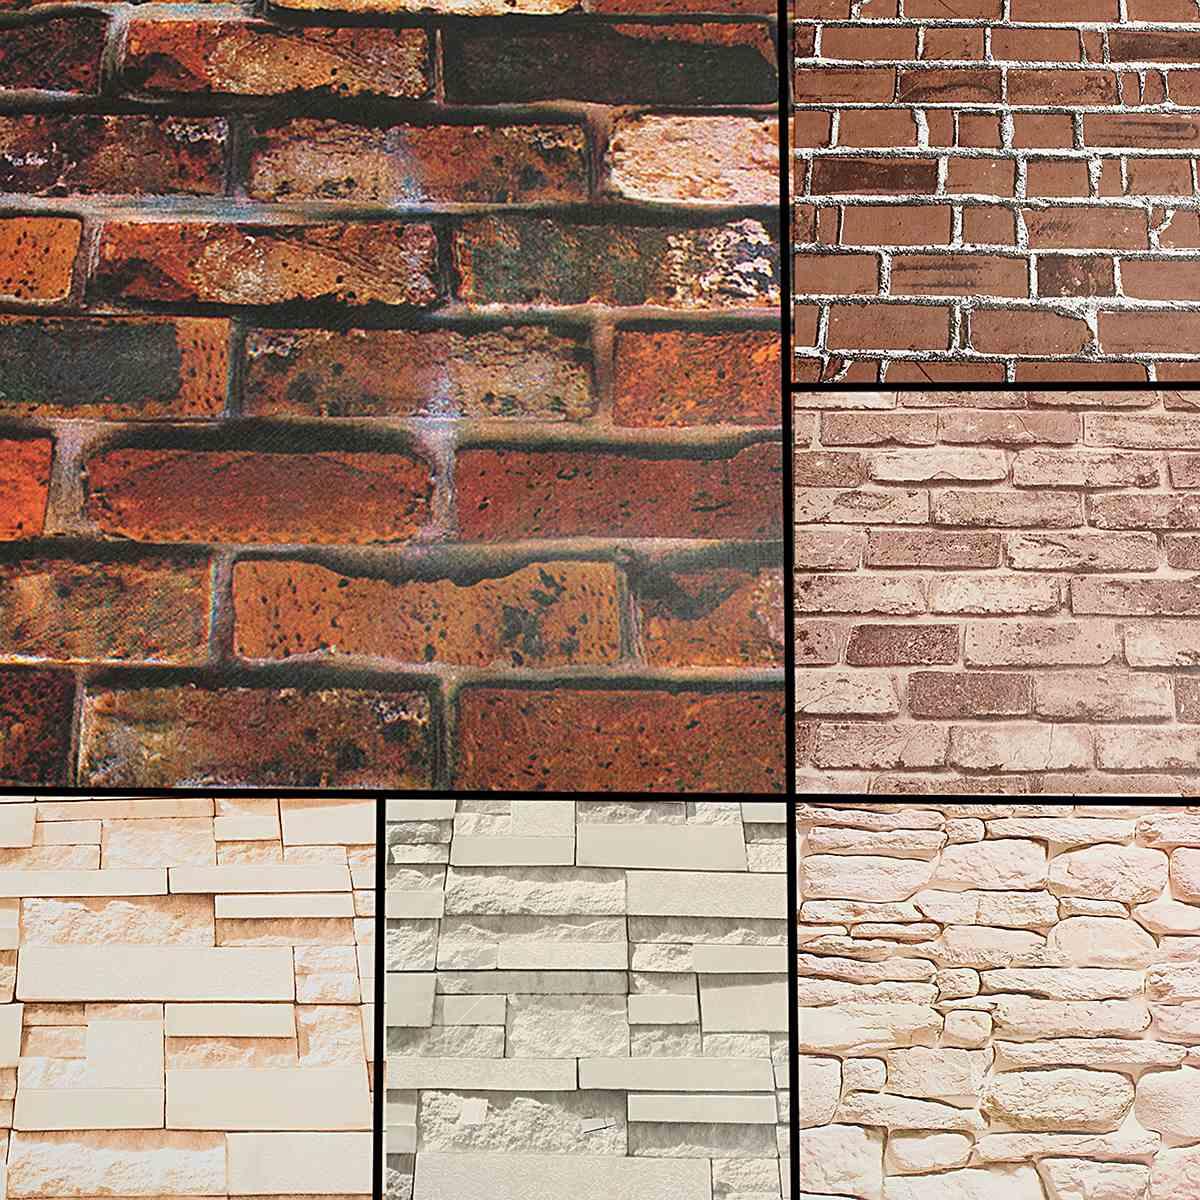 Vintage 3d Brick Wallpaper Roll 45cmx10m Brickwork Self Adhesive Wall Paper Roll Home Shop Decoration